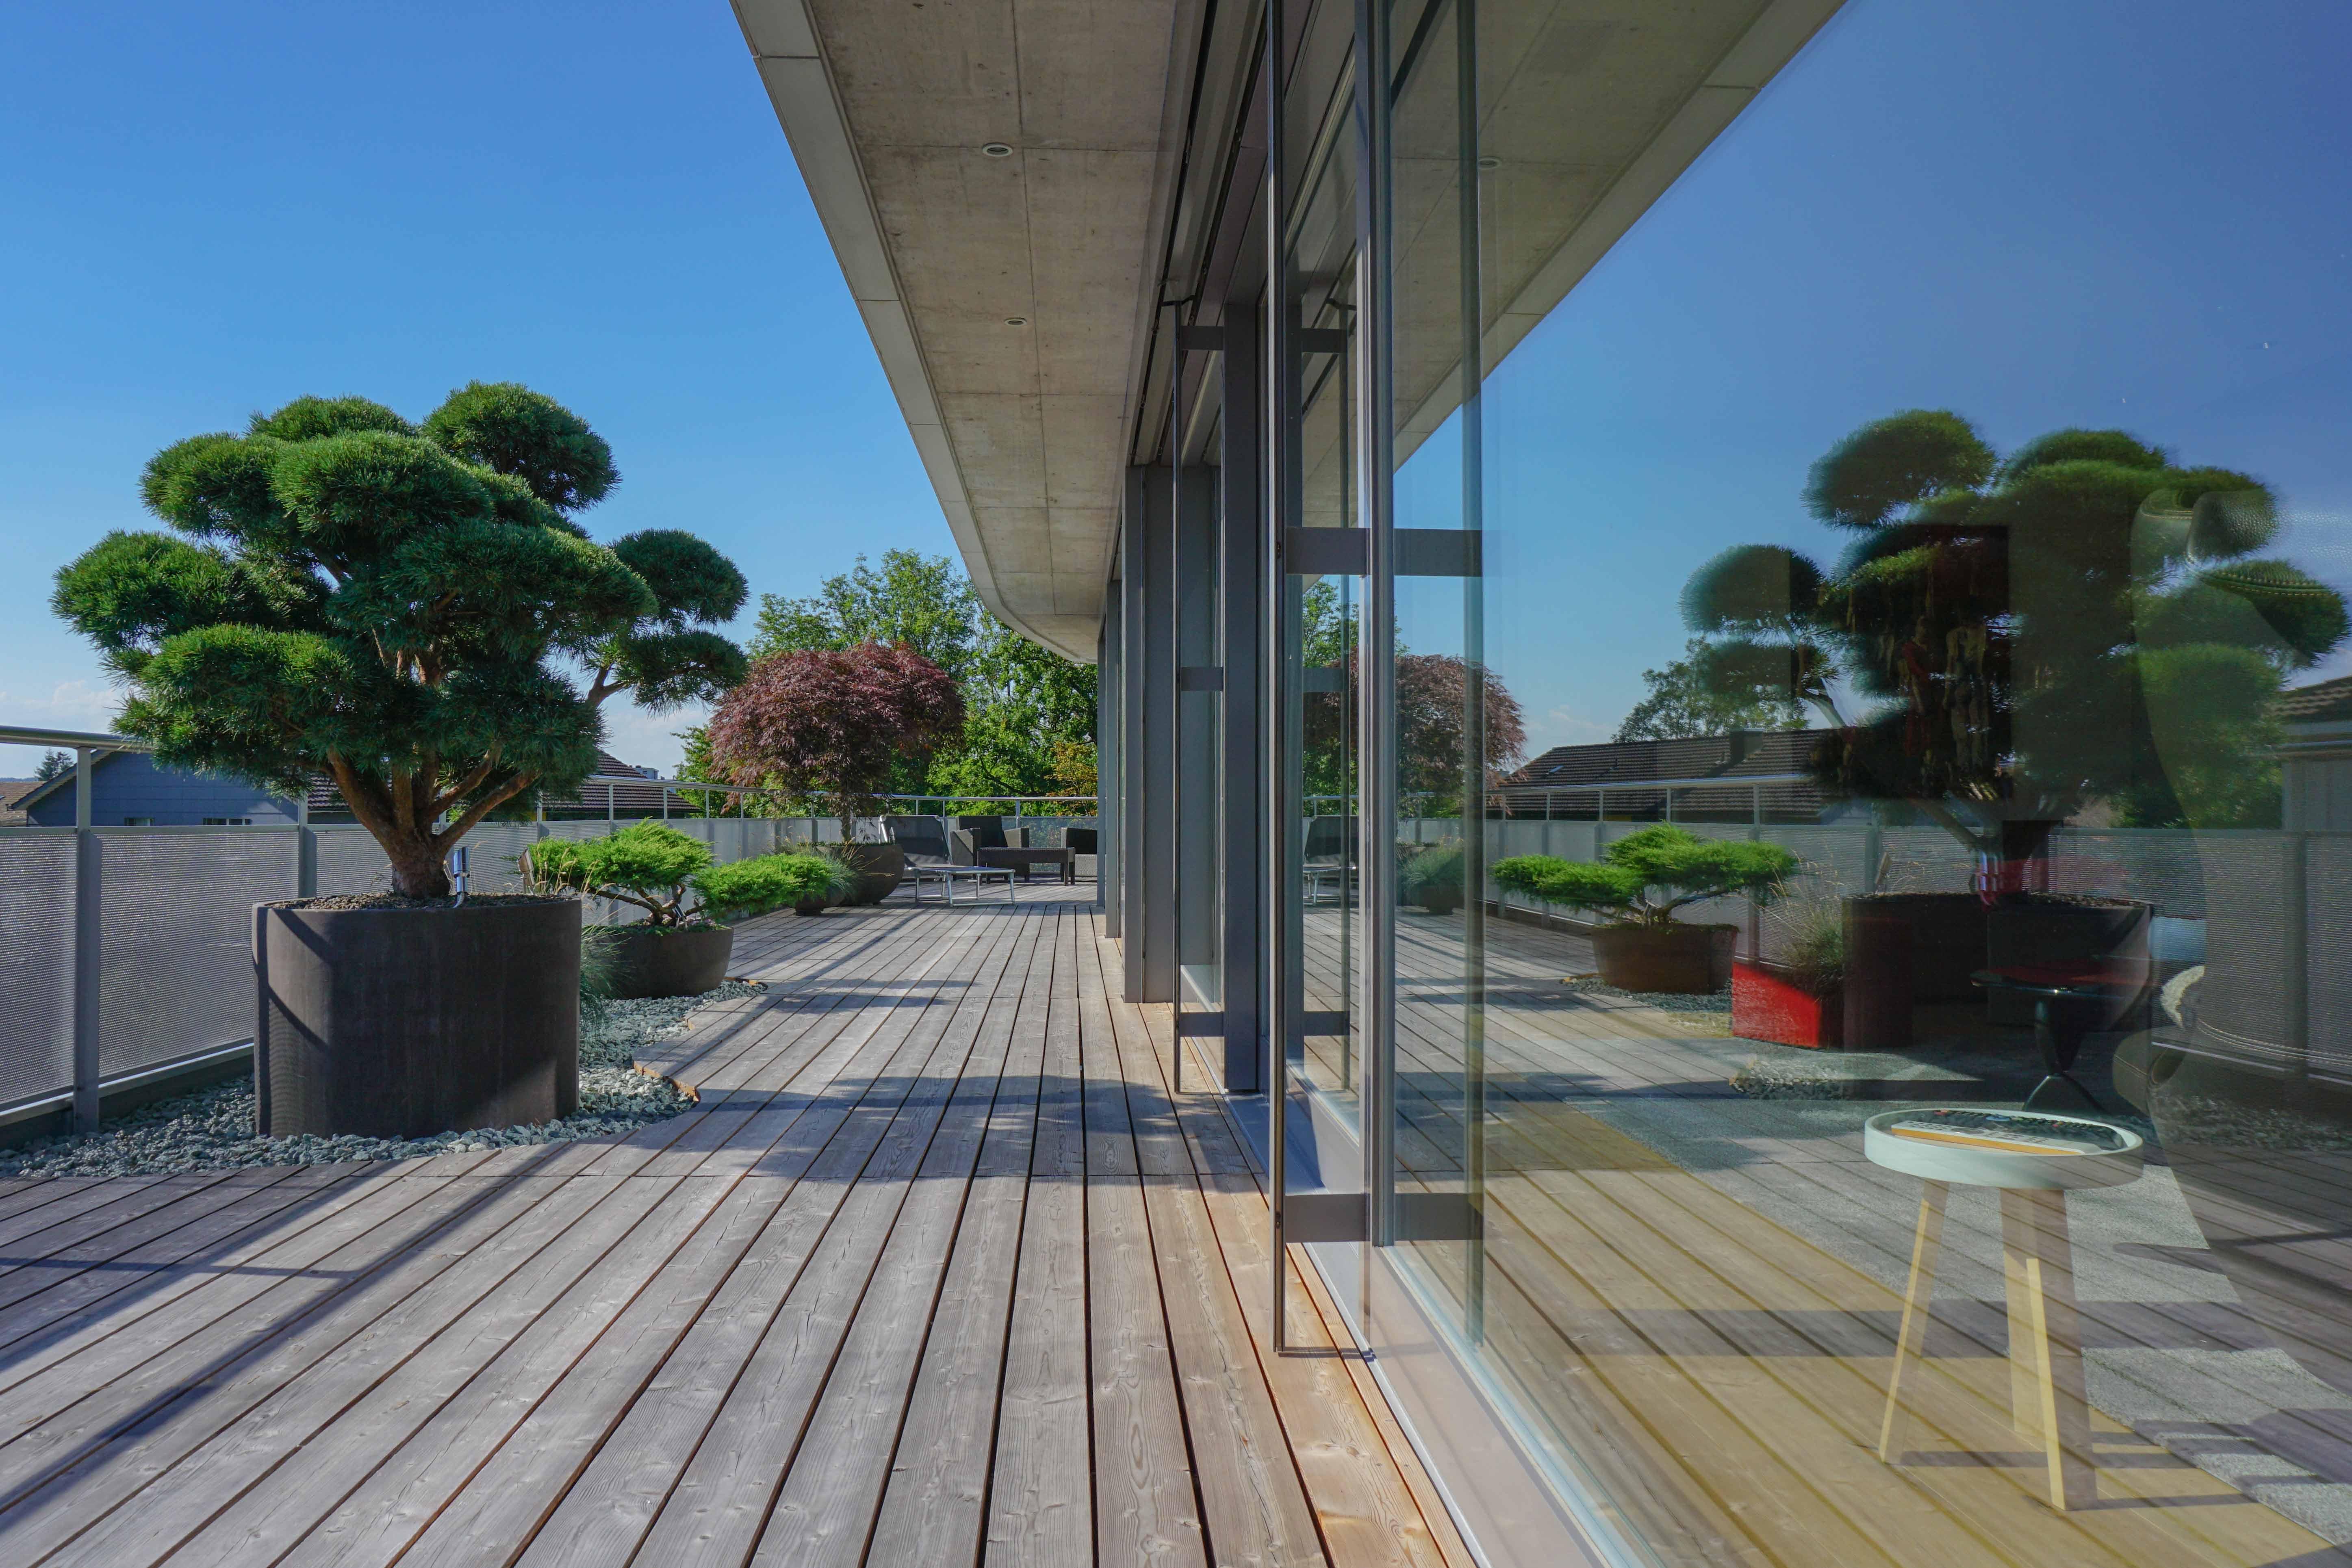 Terrassengestaltung-modern-silvedes-ag